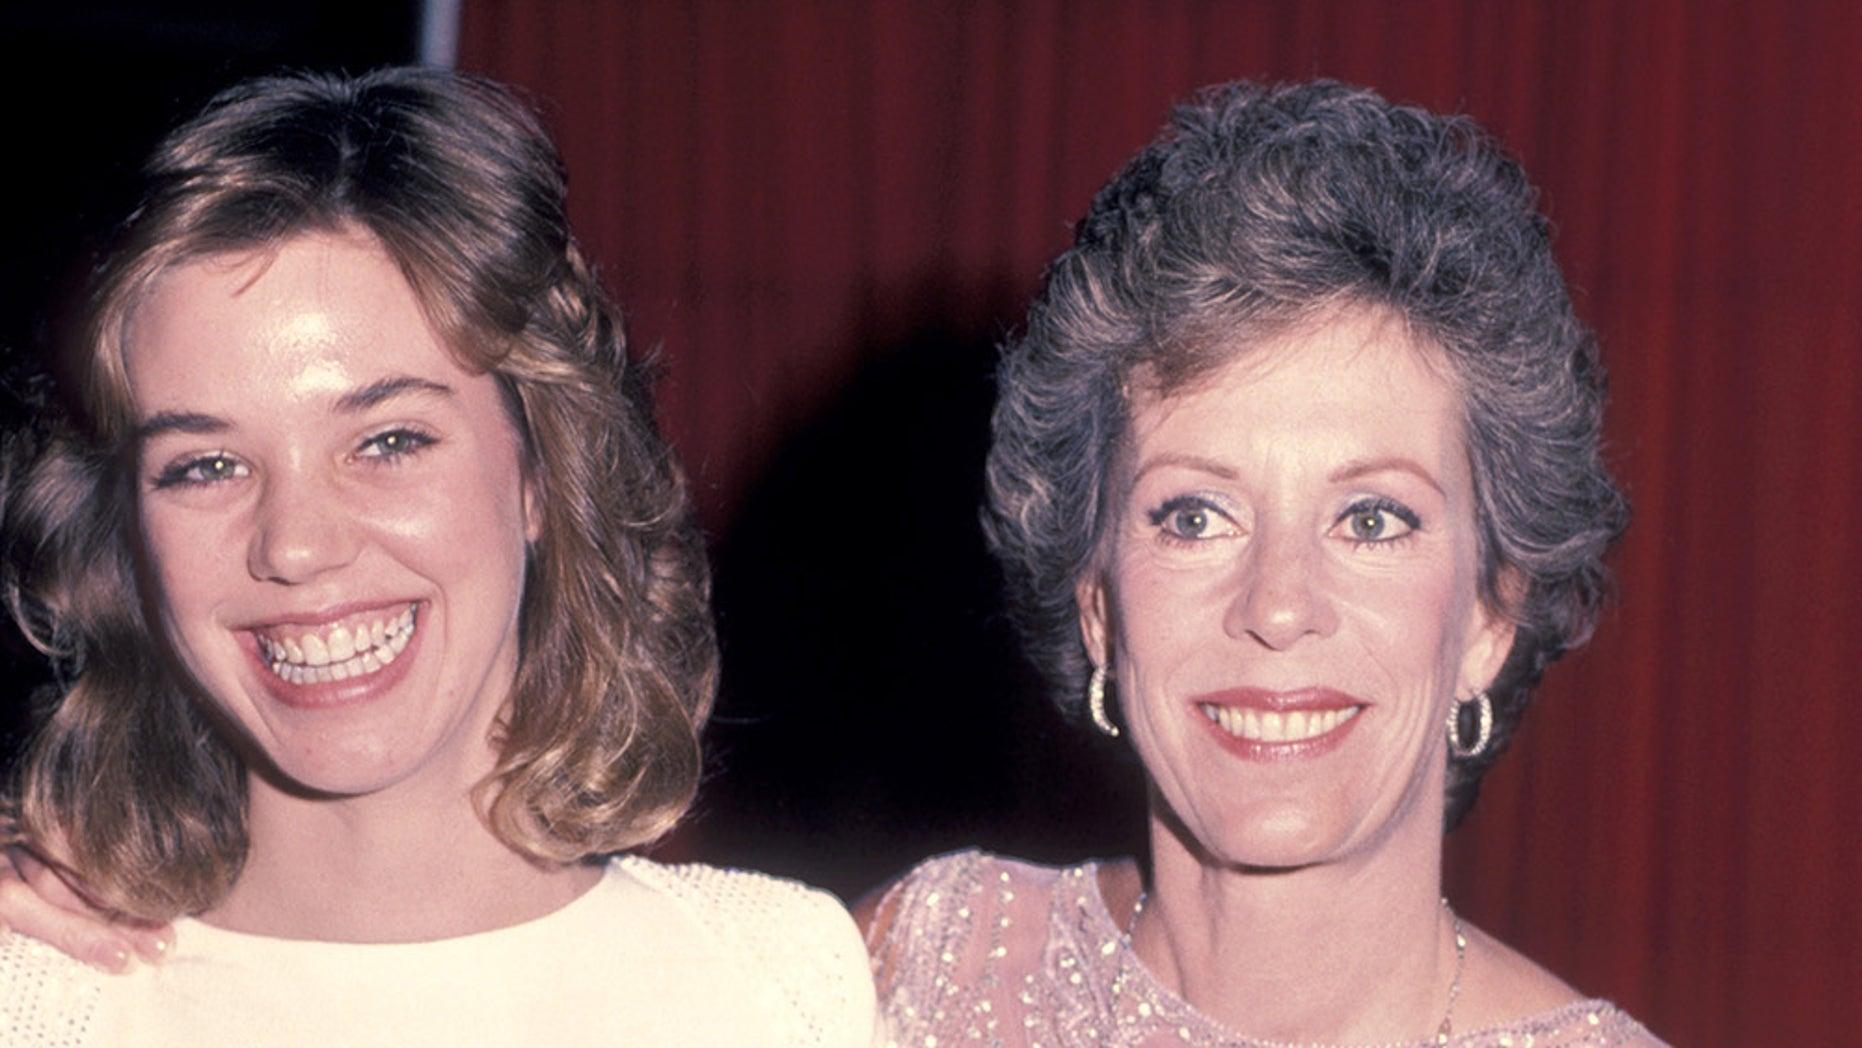 Carol Burnett with her daughter Carrie Hamilton in 1983.